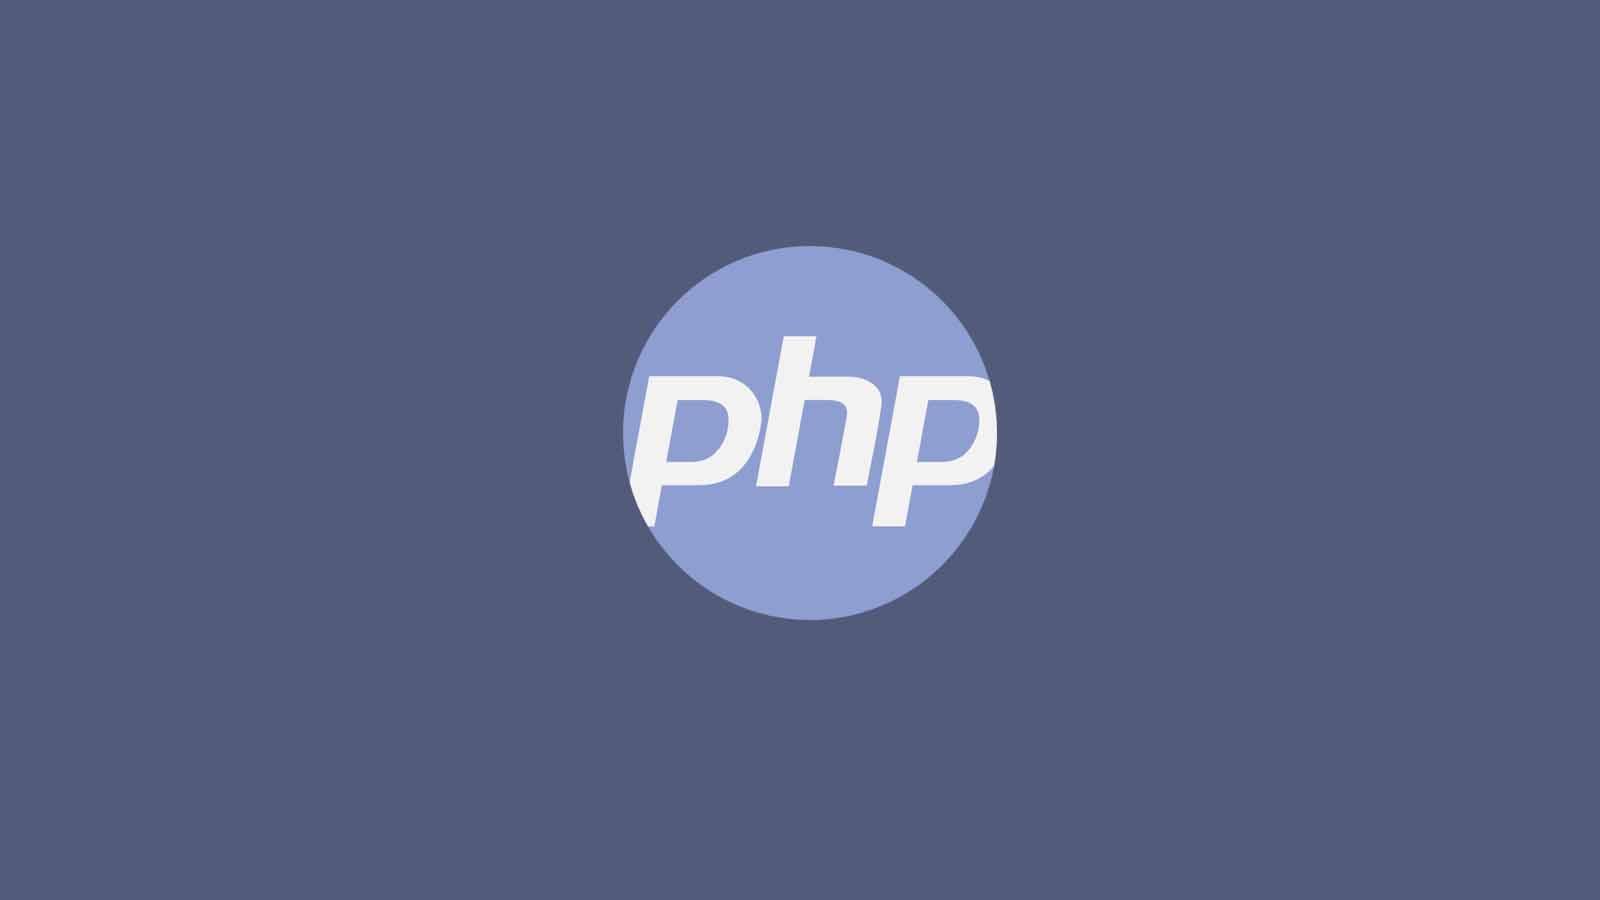 Daftar Isi PHP (Hypertext Preprocessor)